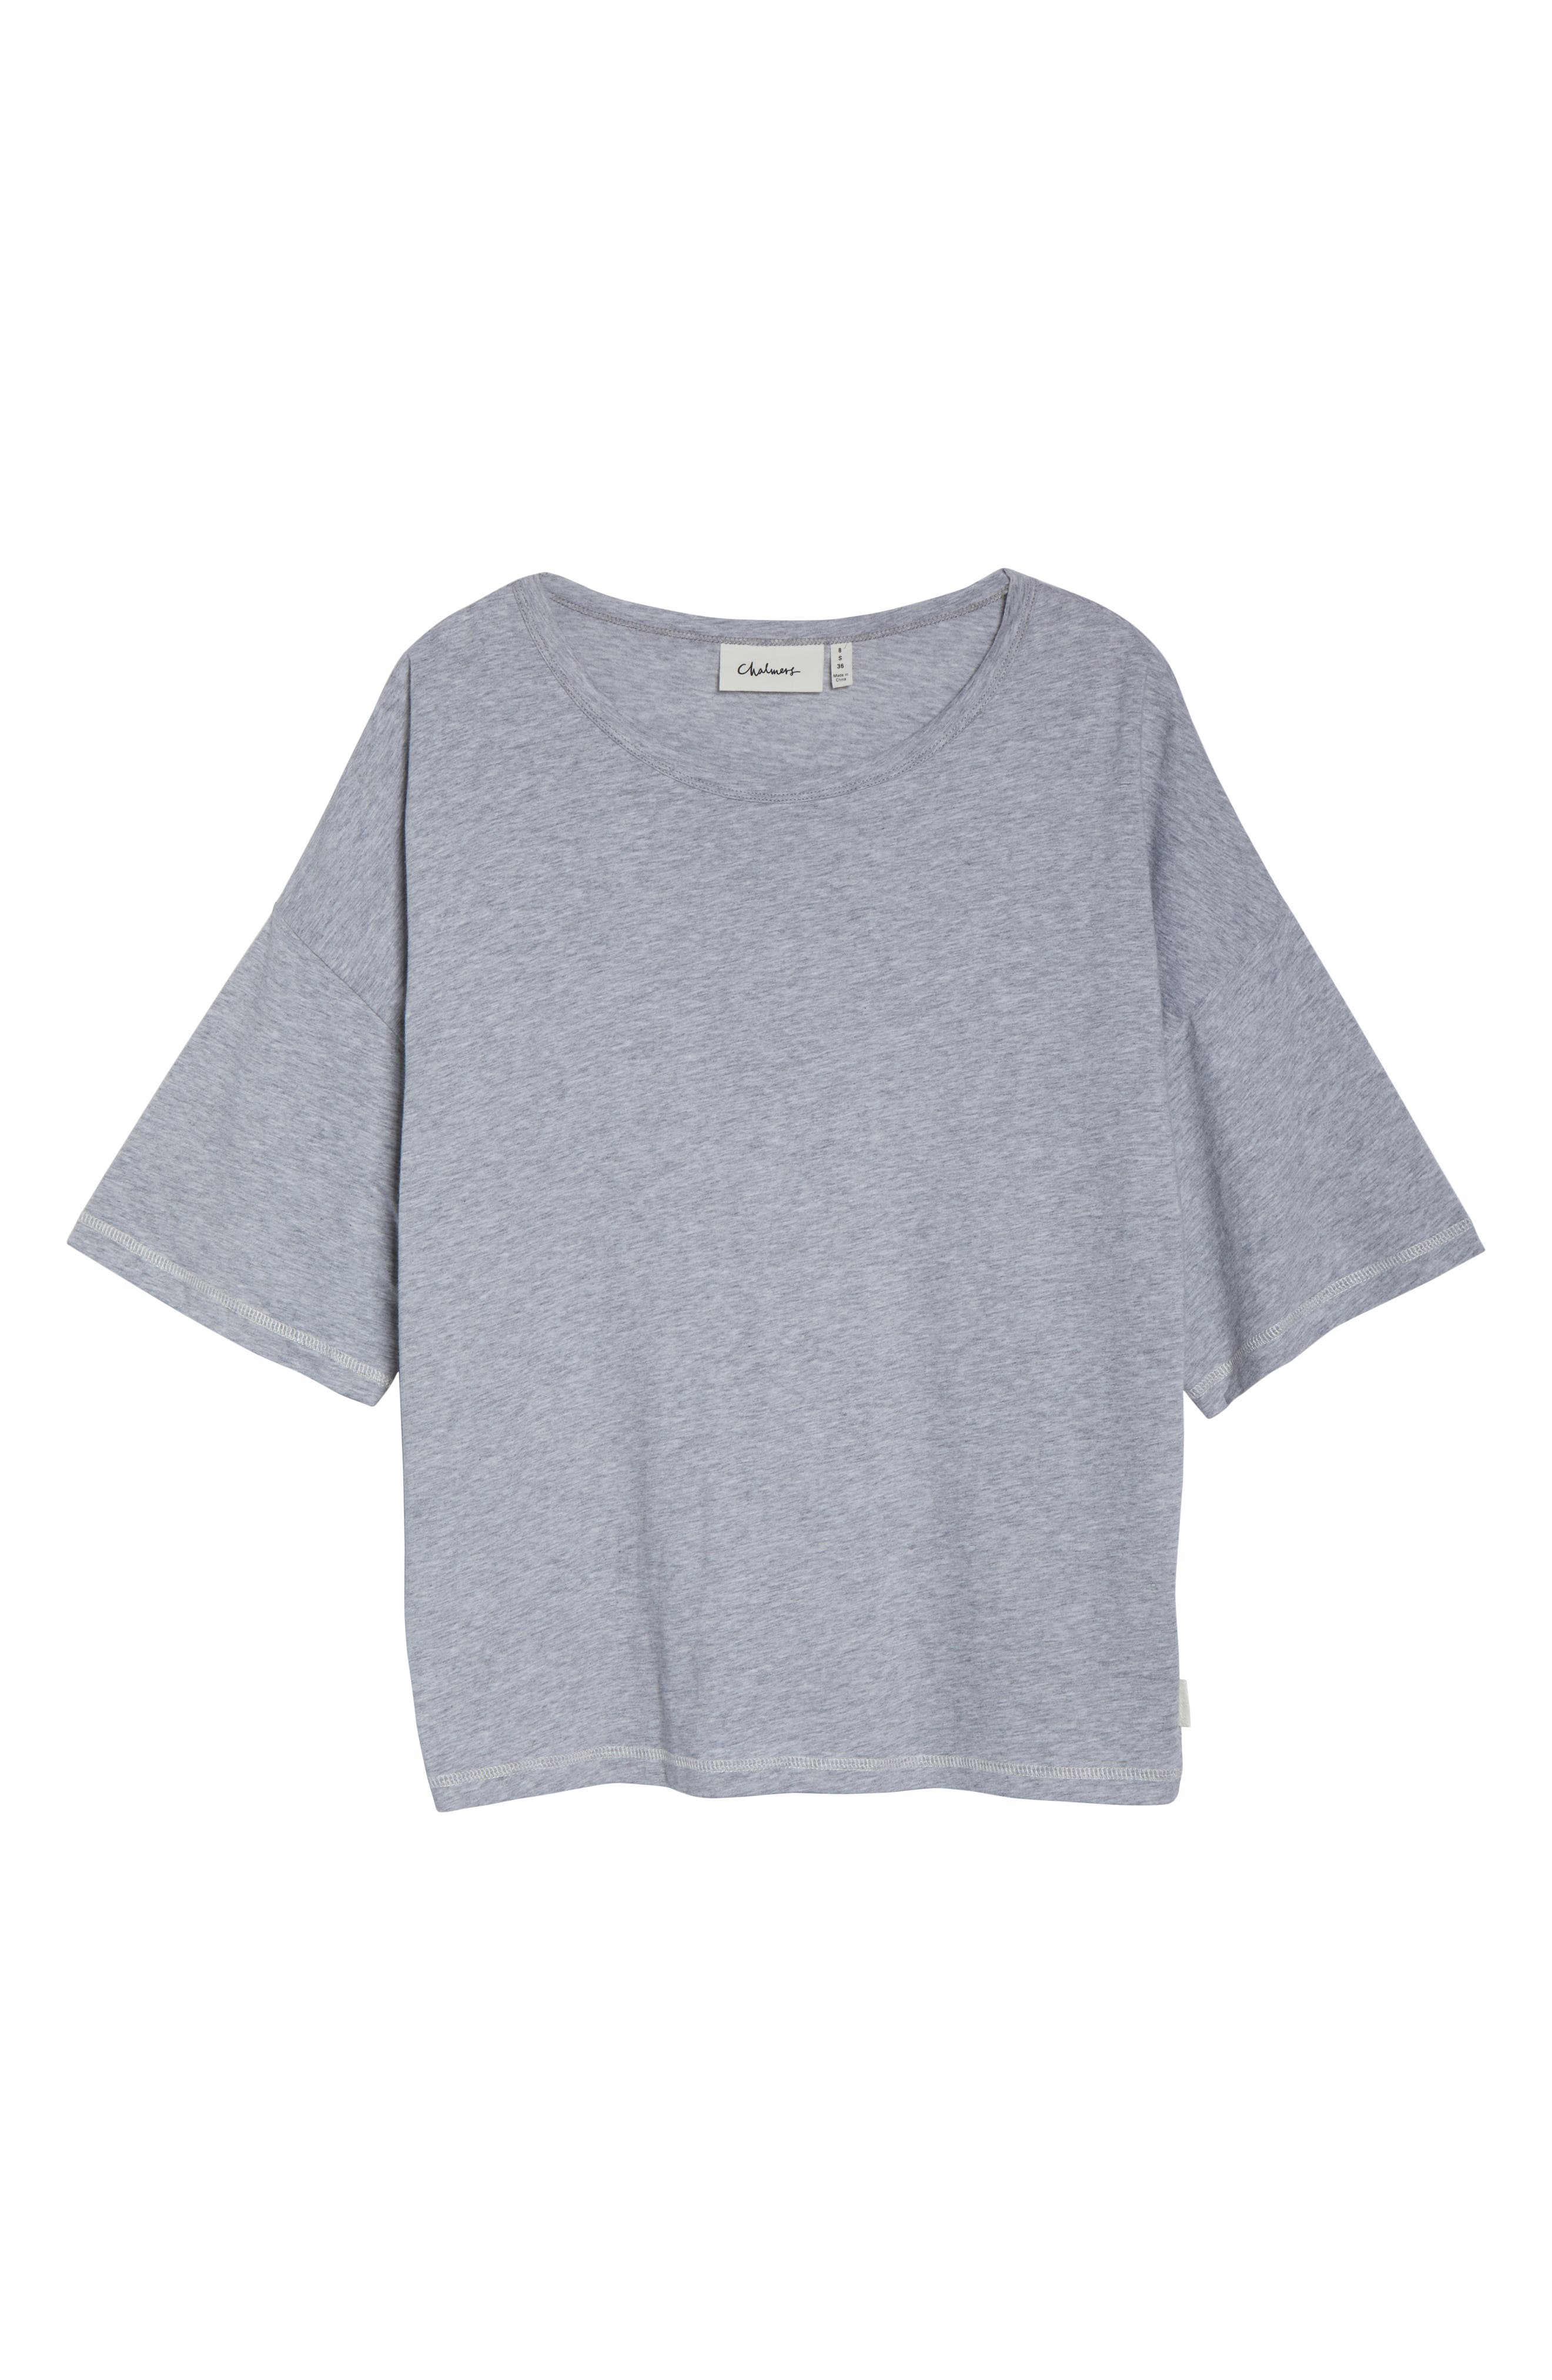 Soph Lounge Shirt,                             Alternate thumbnail 6, color,                             SMOKE MARLE